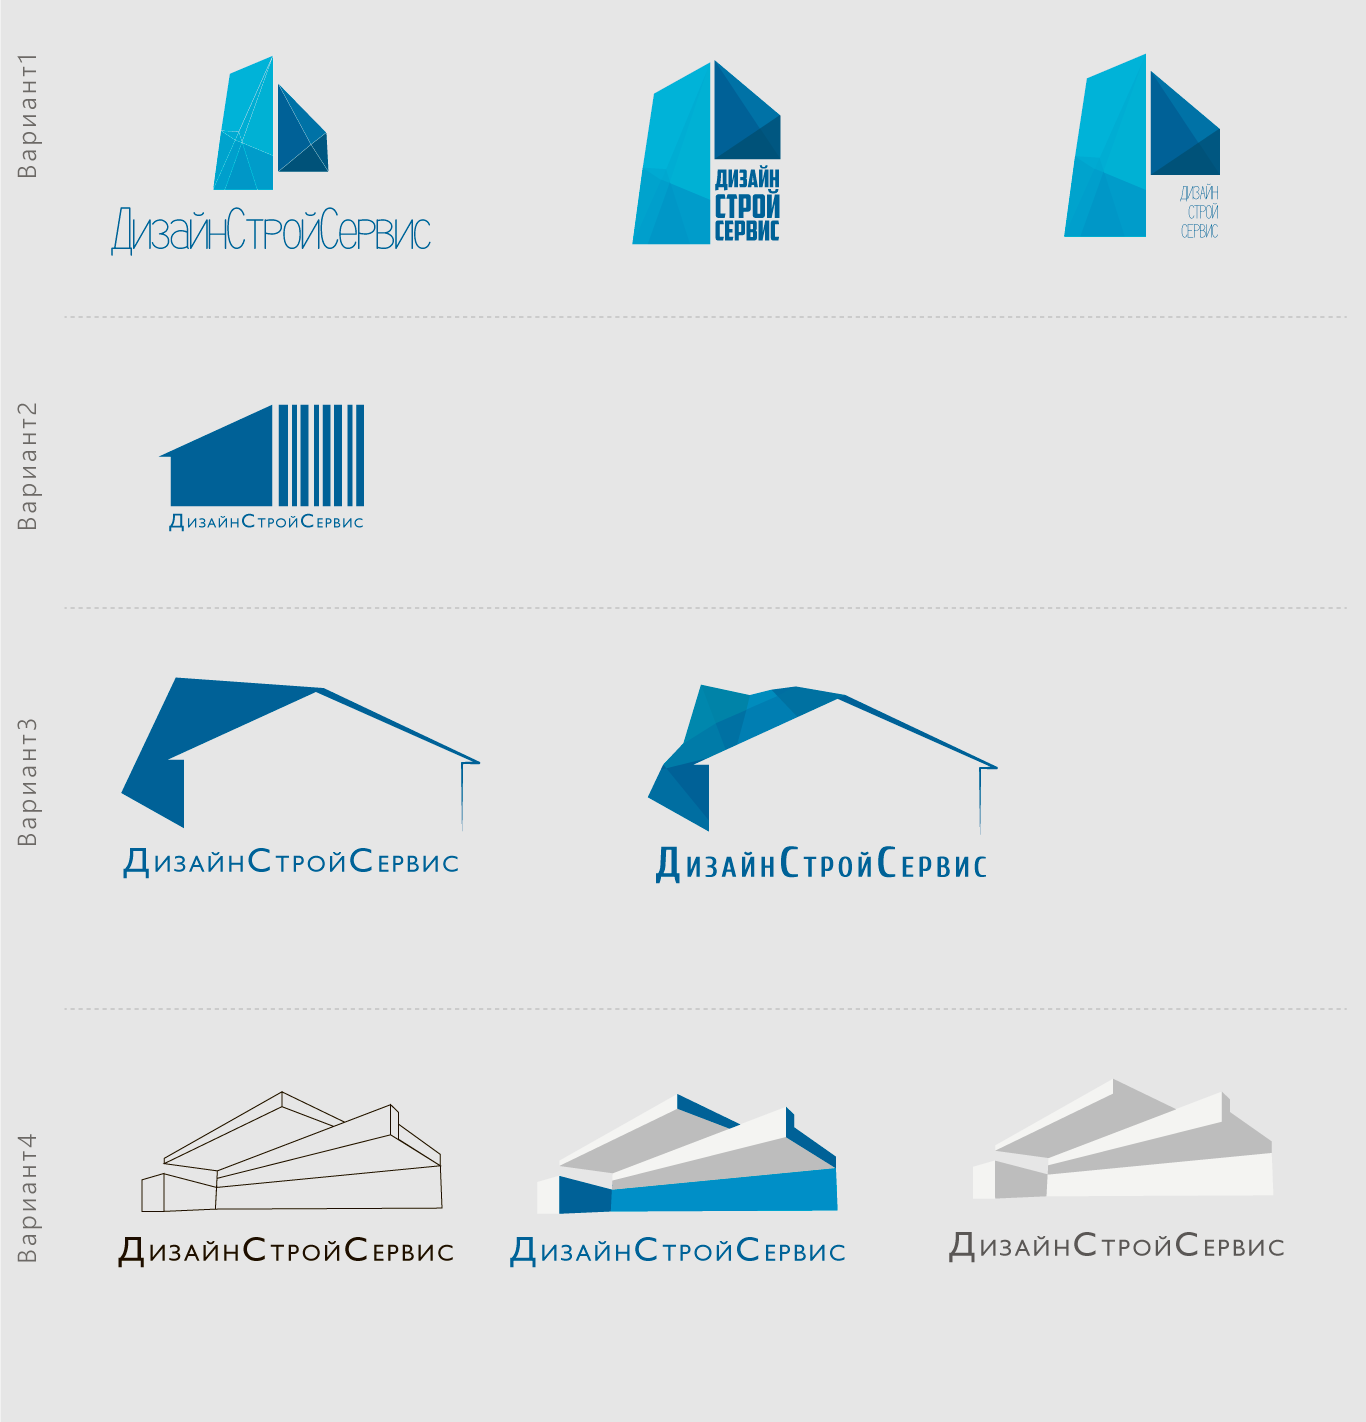 Designstroyservice sochi logo design construction for Remodeling companies